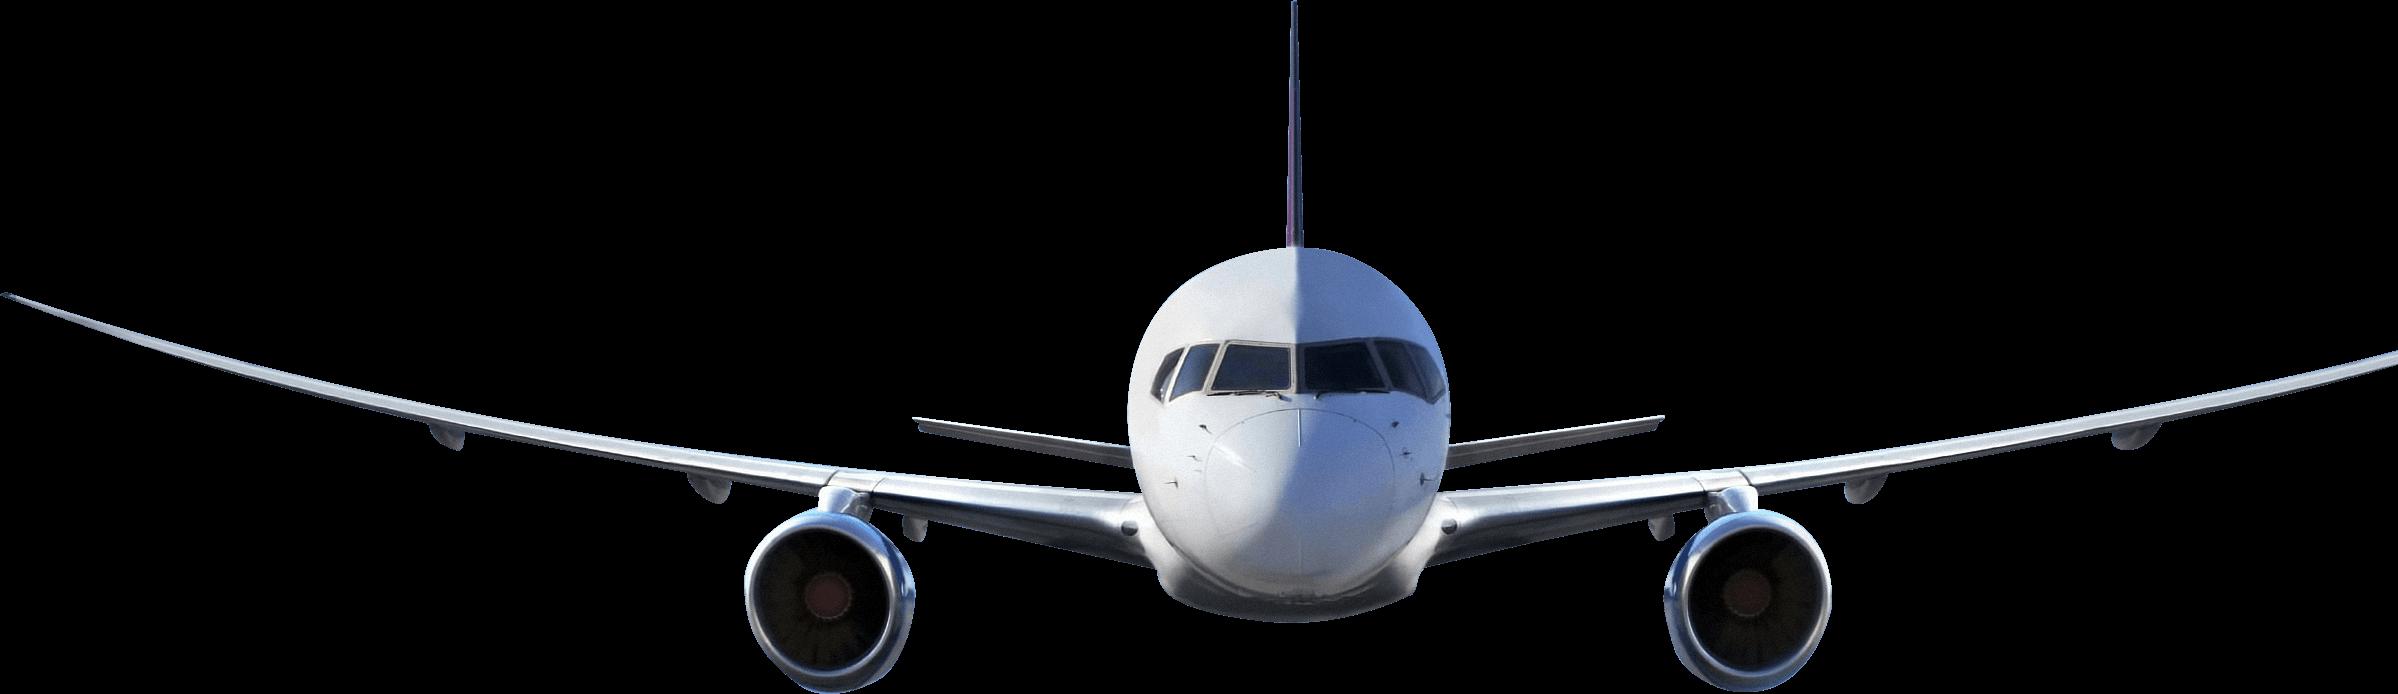 Clipart plane front. Transparent png stickpng